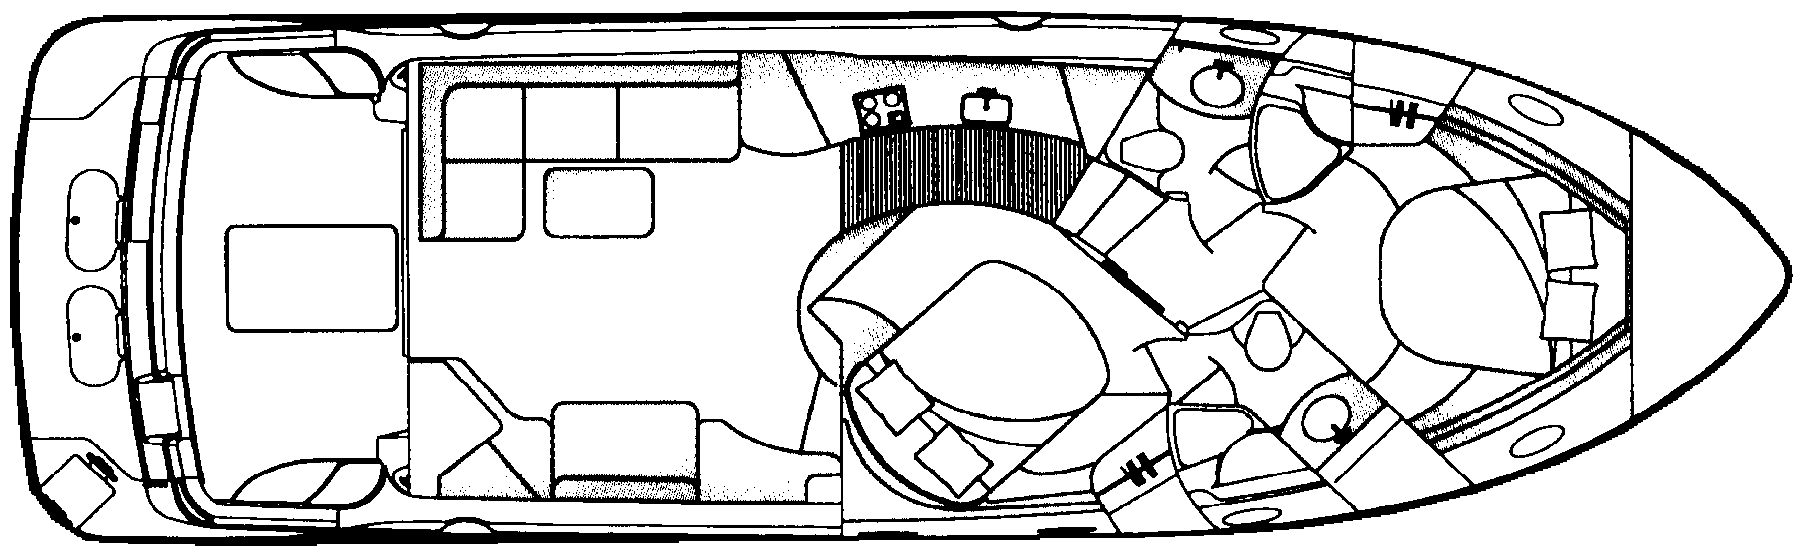 Carver 450 Voyager Floor Plan 2